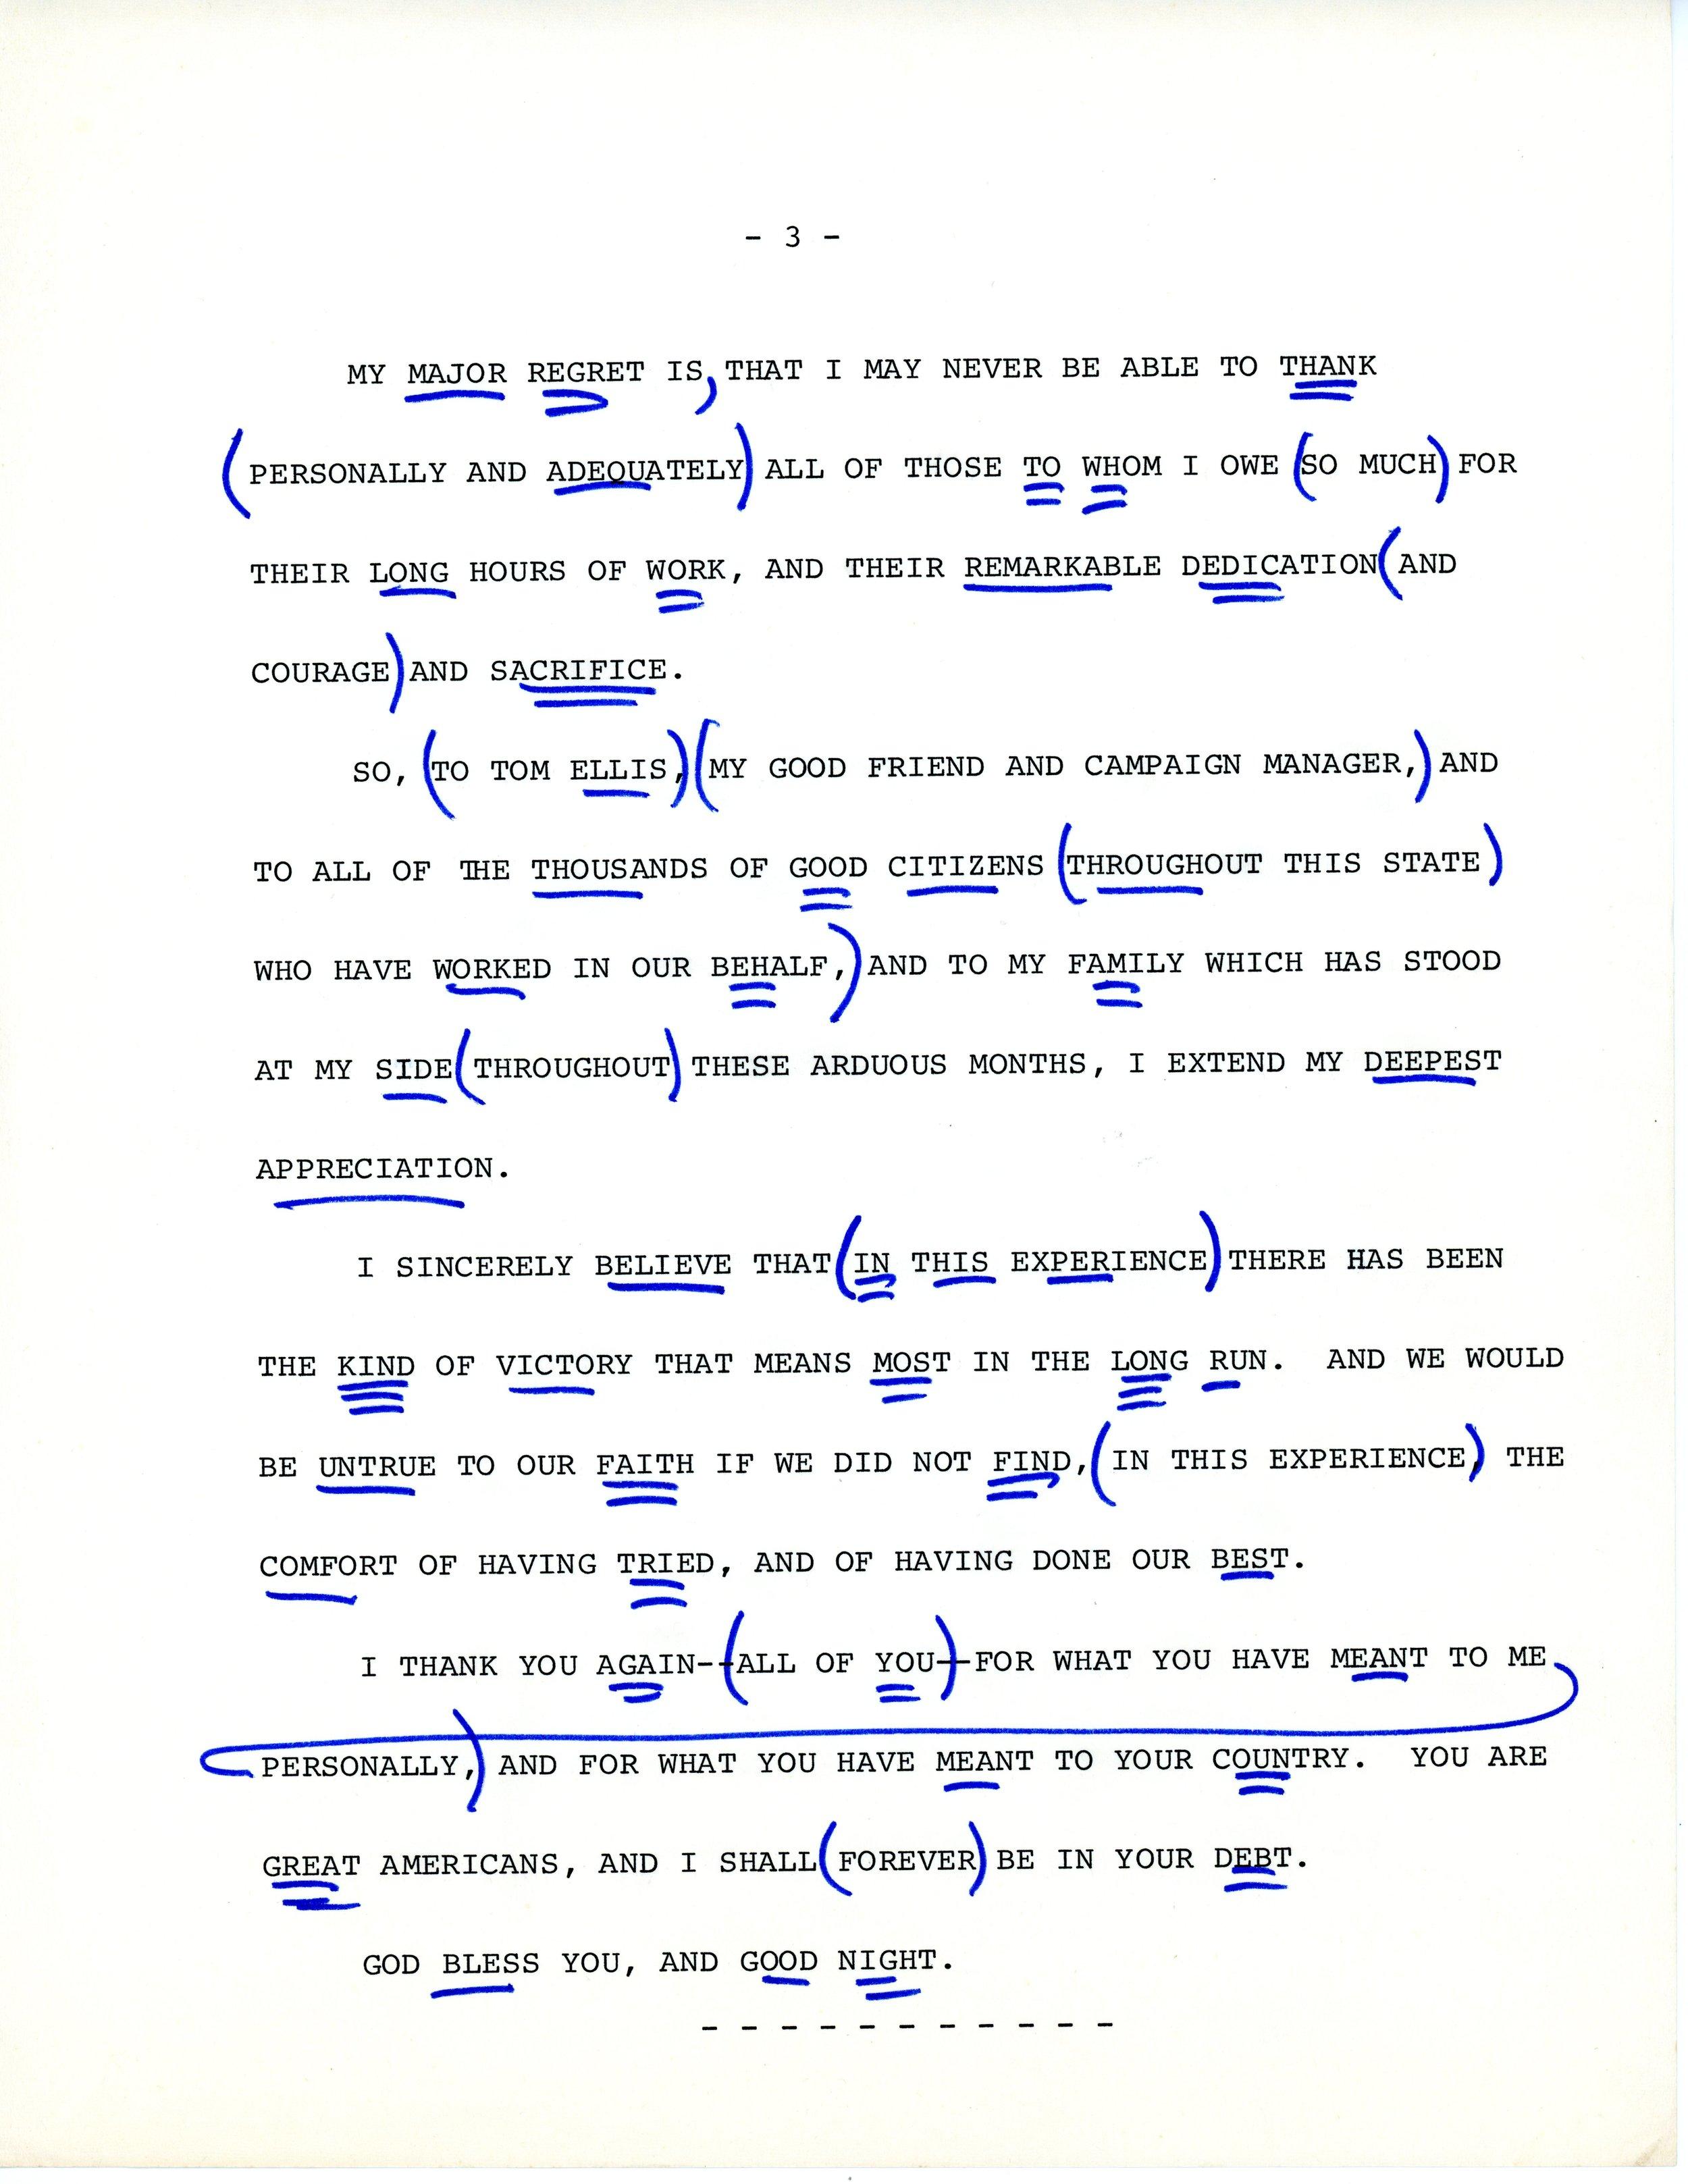 Helms 1972 Concession Speech003.jpg